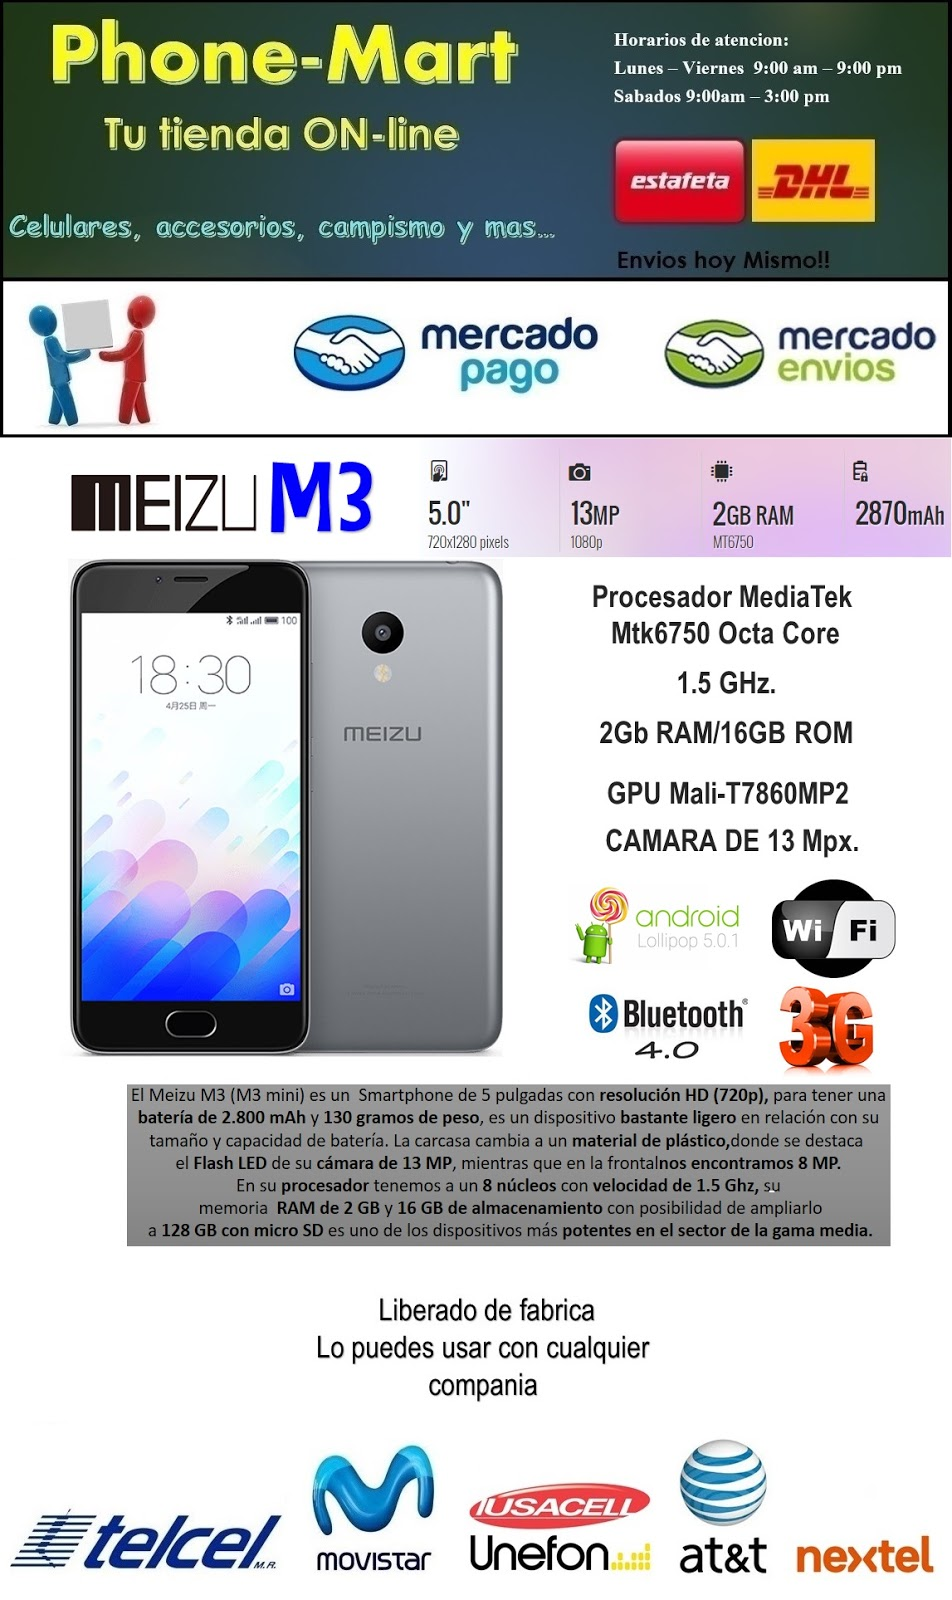 celular meizu M3 smartphone android flyme octa core